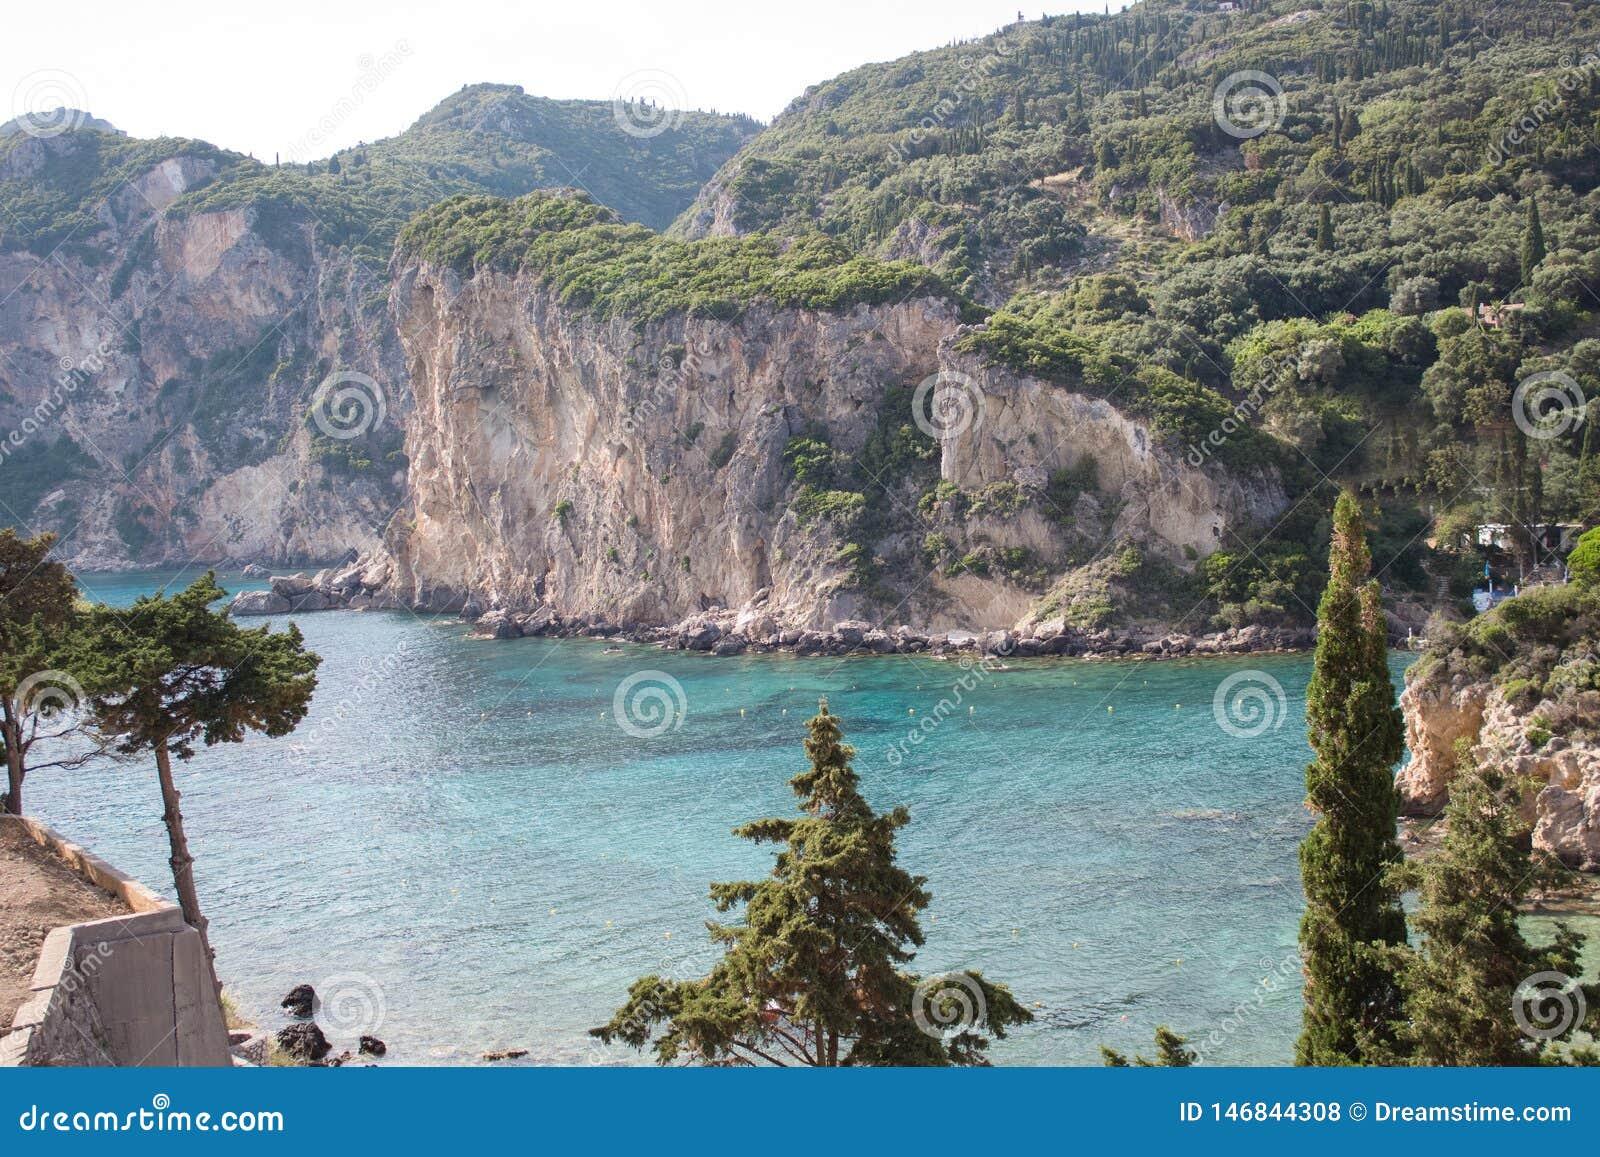 Marine landscape. Ionian Sea. Paleokastritsa. Corfu Island. Greece.